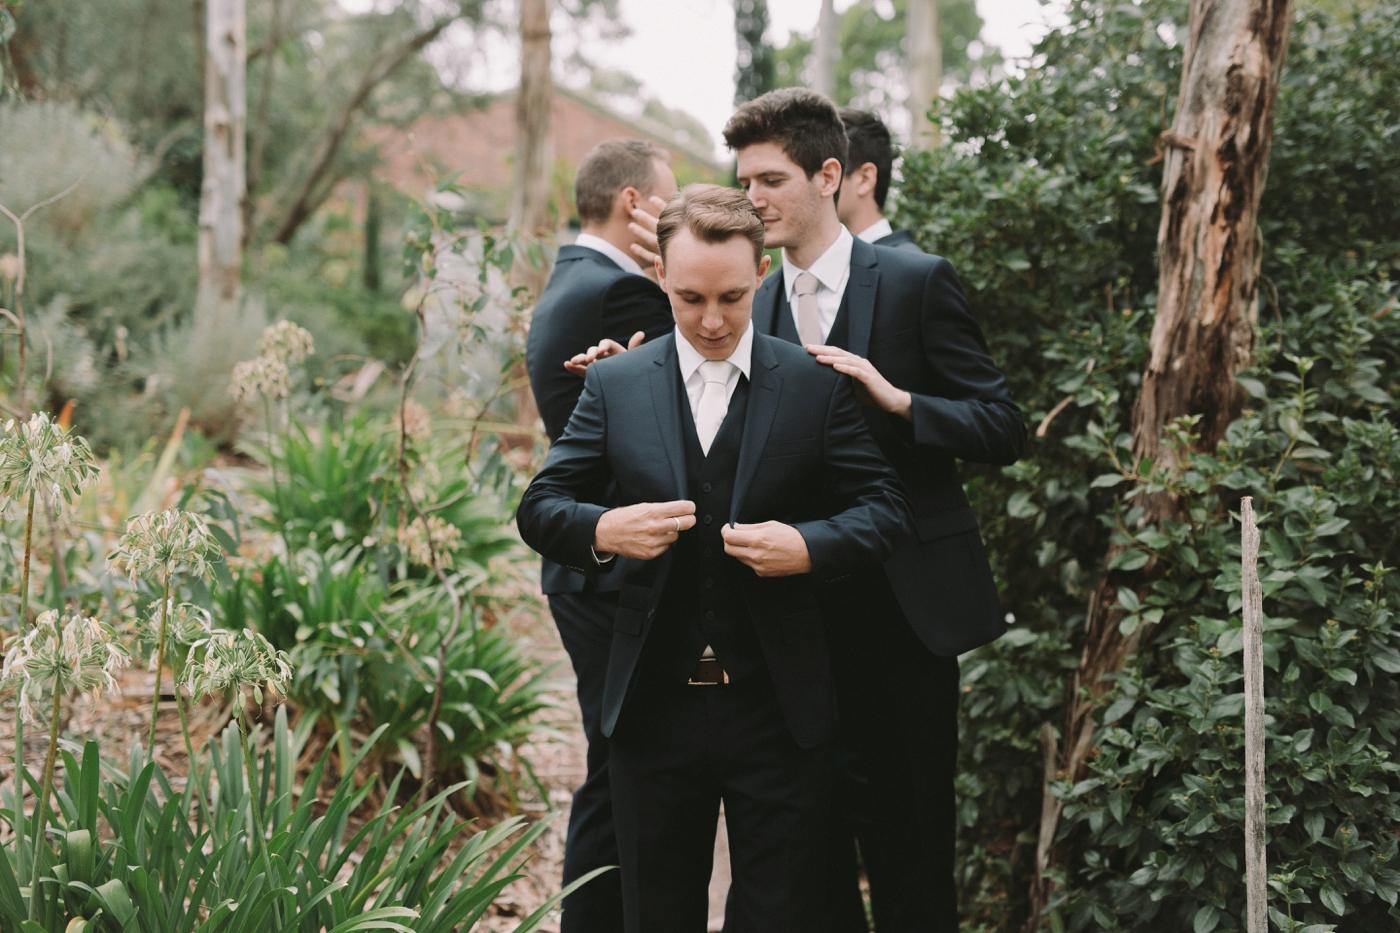 Jasmine and Adam - Natural wedding photographer in Adelaide - Candid Wedding Photographer Adelaide - www.katherineschultzphotography.com 4